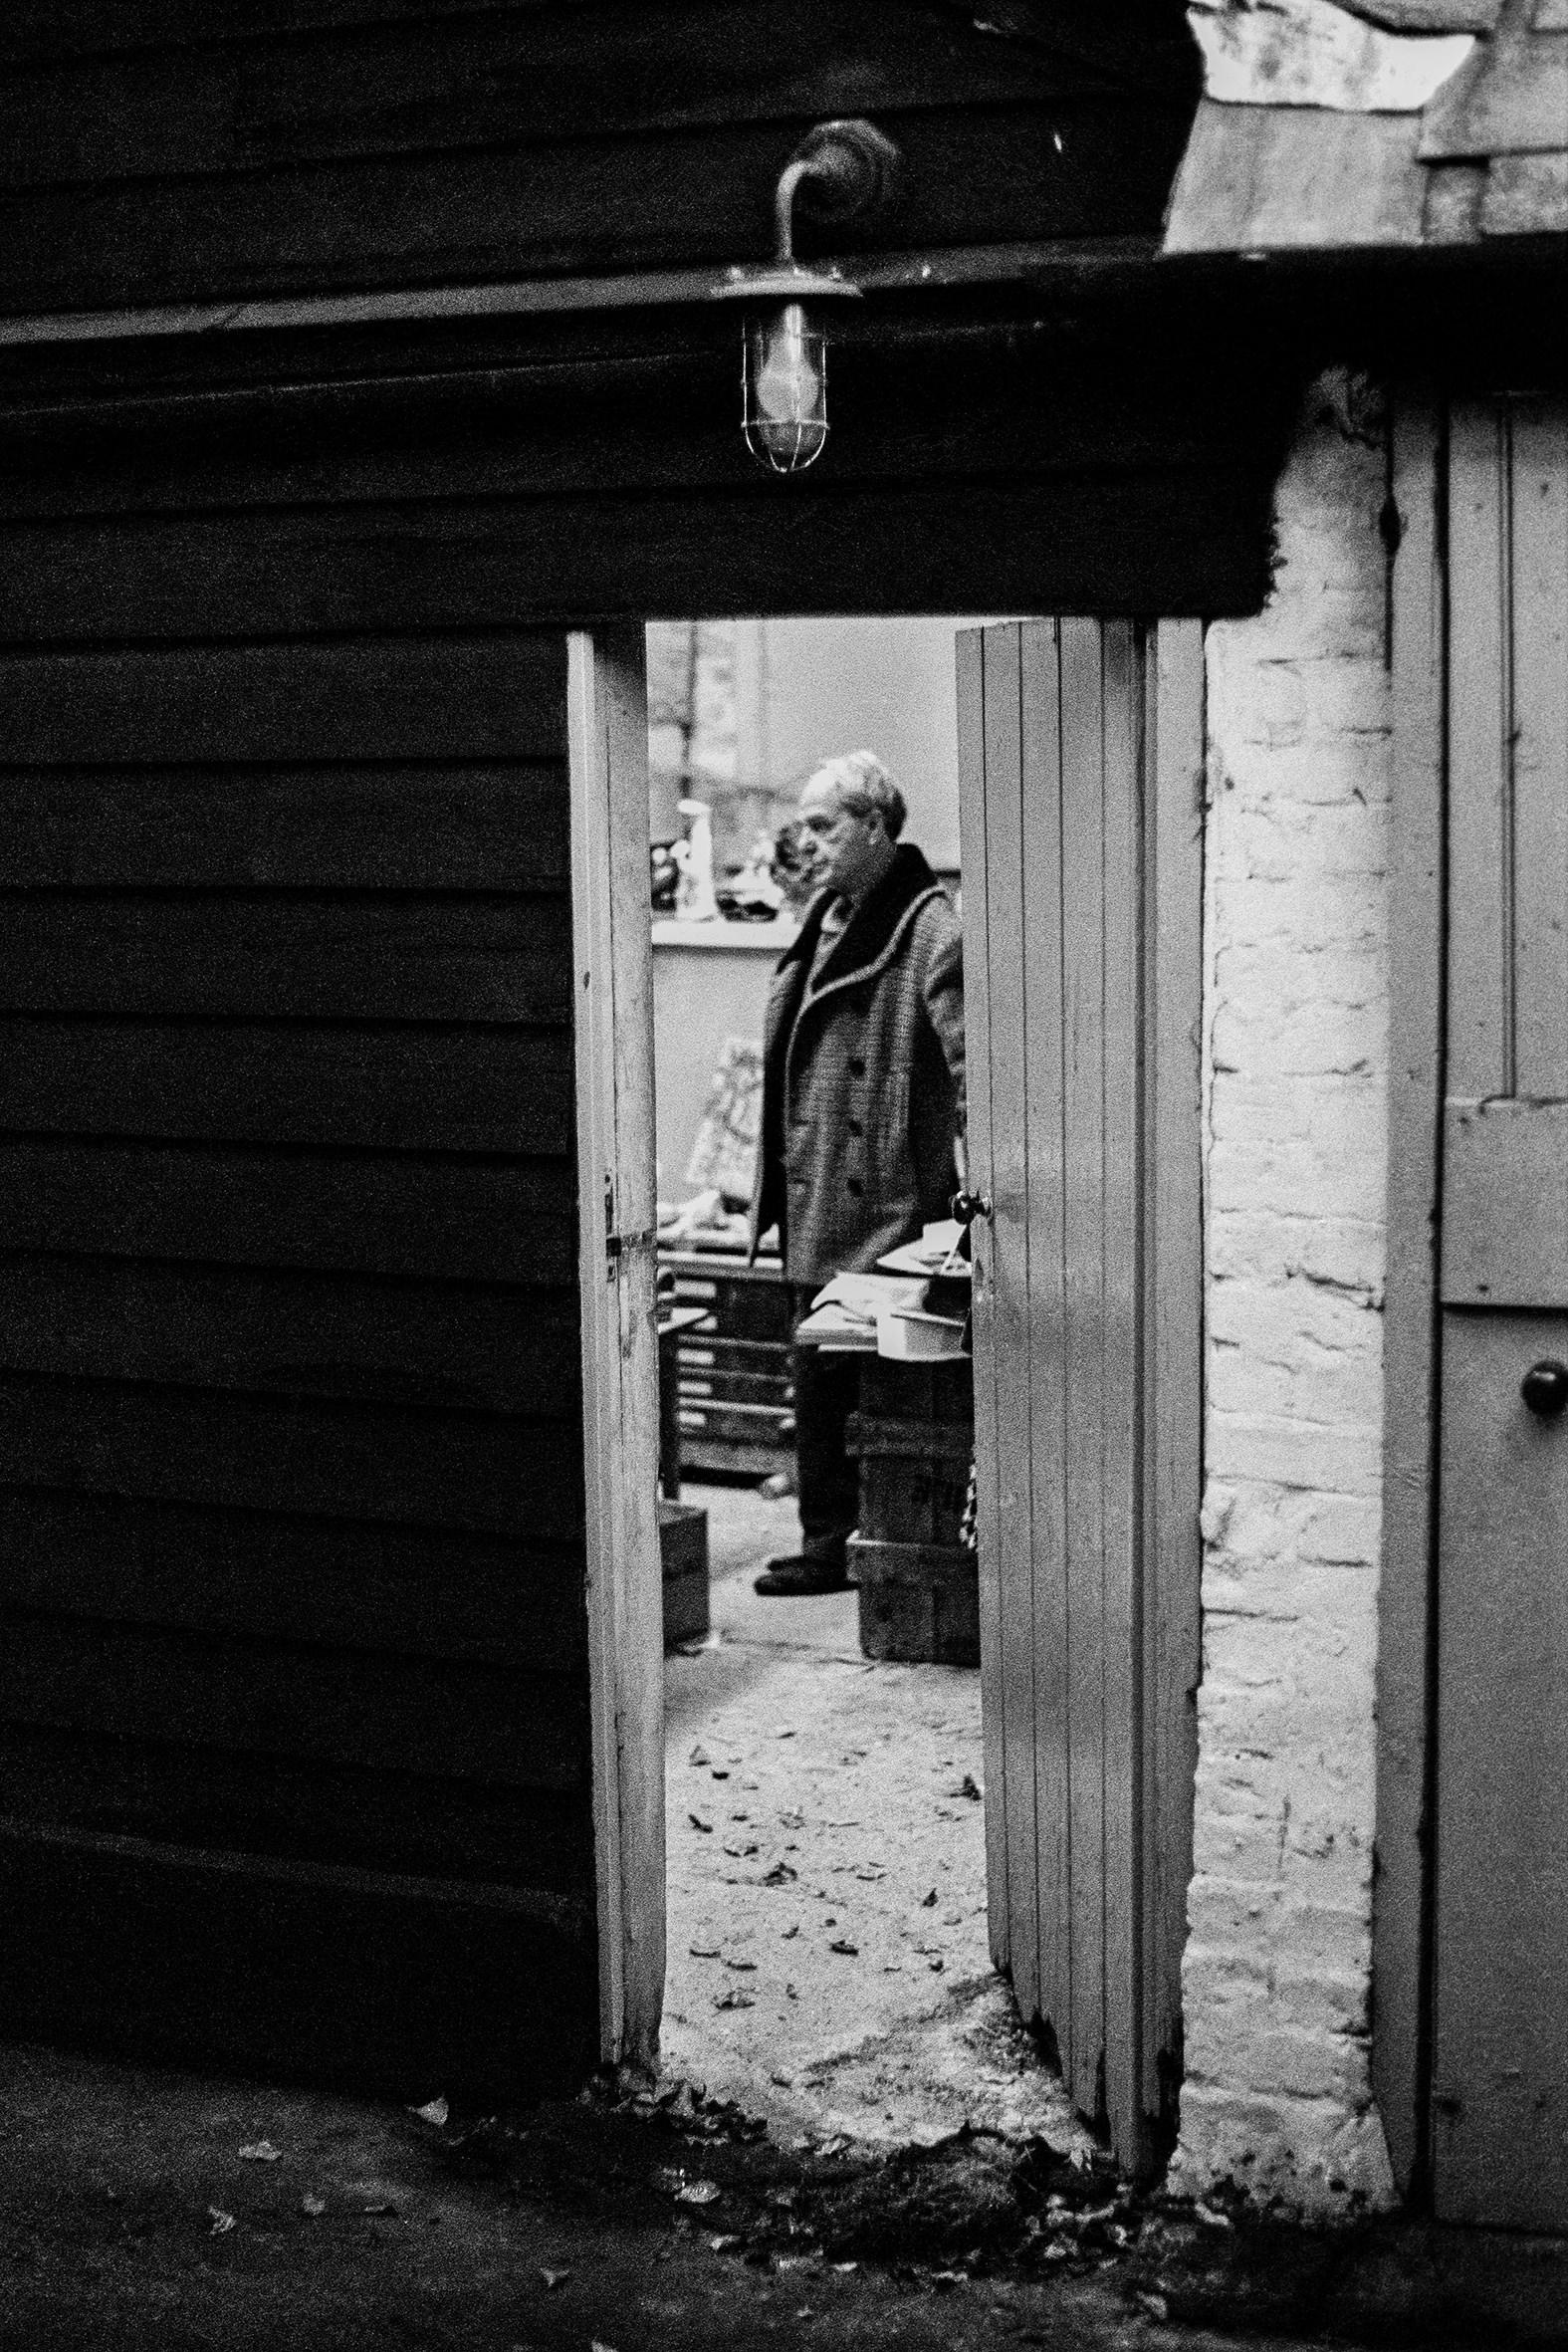 ARTISTI - 10 – Henry  Moore, nel suo studio a Much Hadham, Inghilterra, 1961